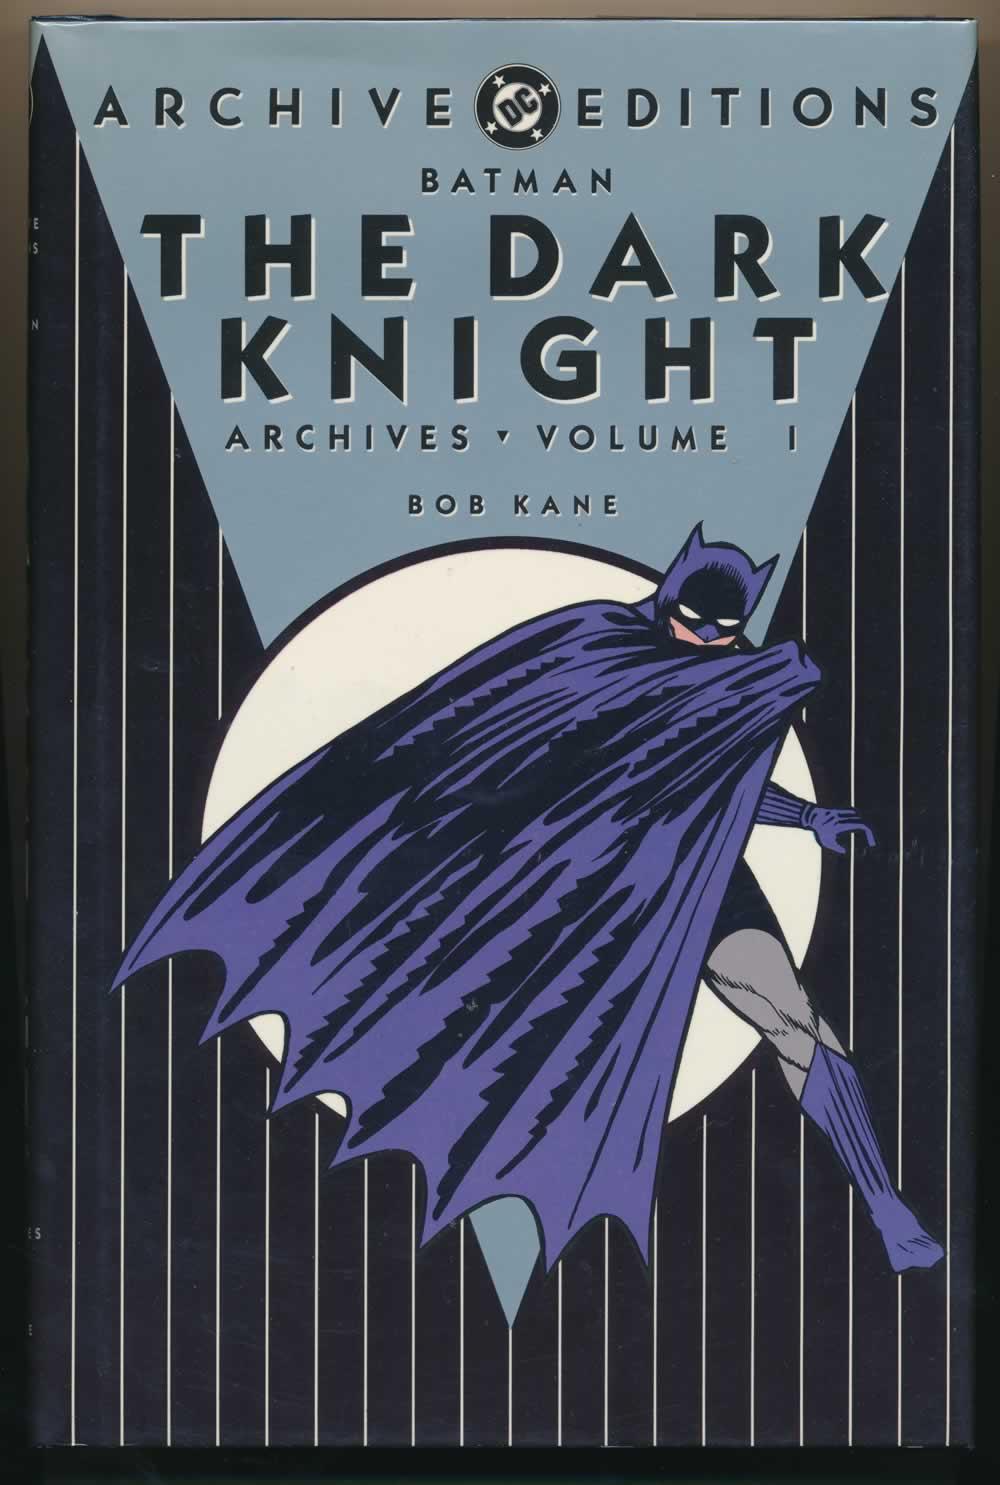 Batman: the dark knight archives: volume I